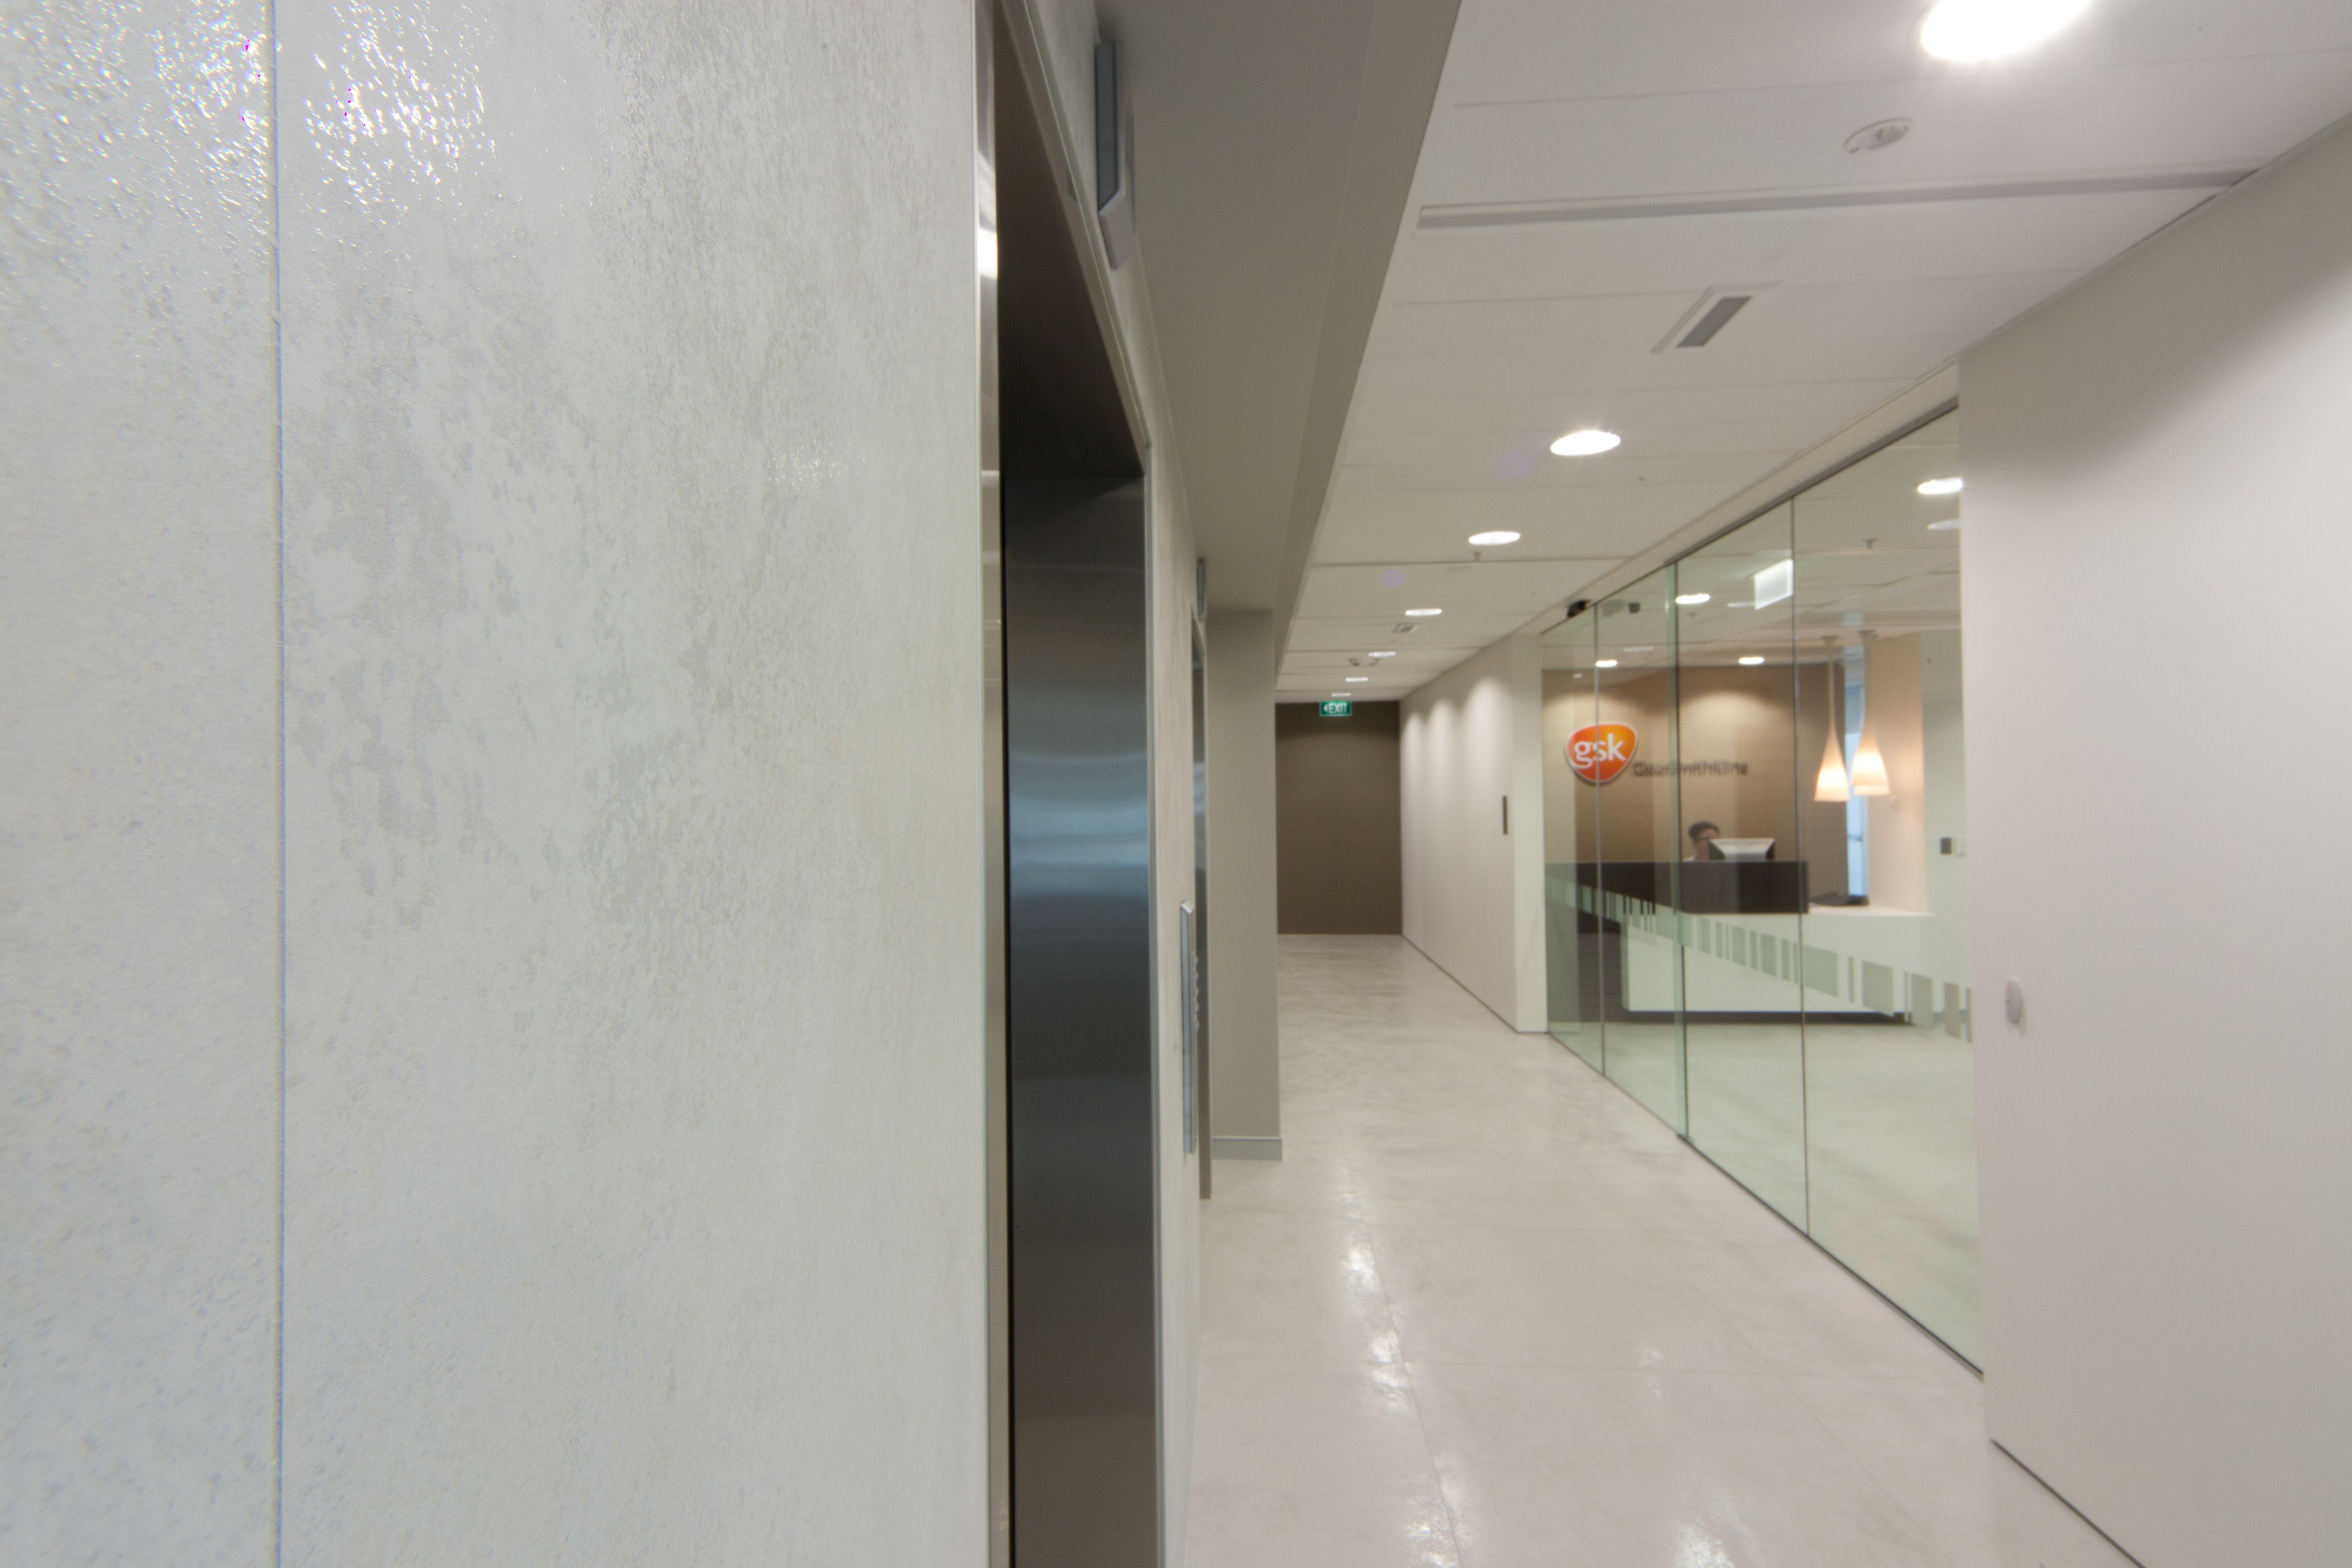 Laminam thin ceramic tiles for floors walls and exteriors laminam thin ceramic tiles for floors walls and exteriors featuring laminam oxide perla dailygadgetfo Choice Image